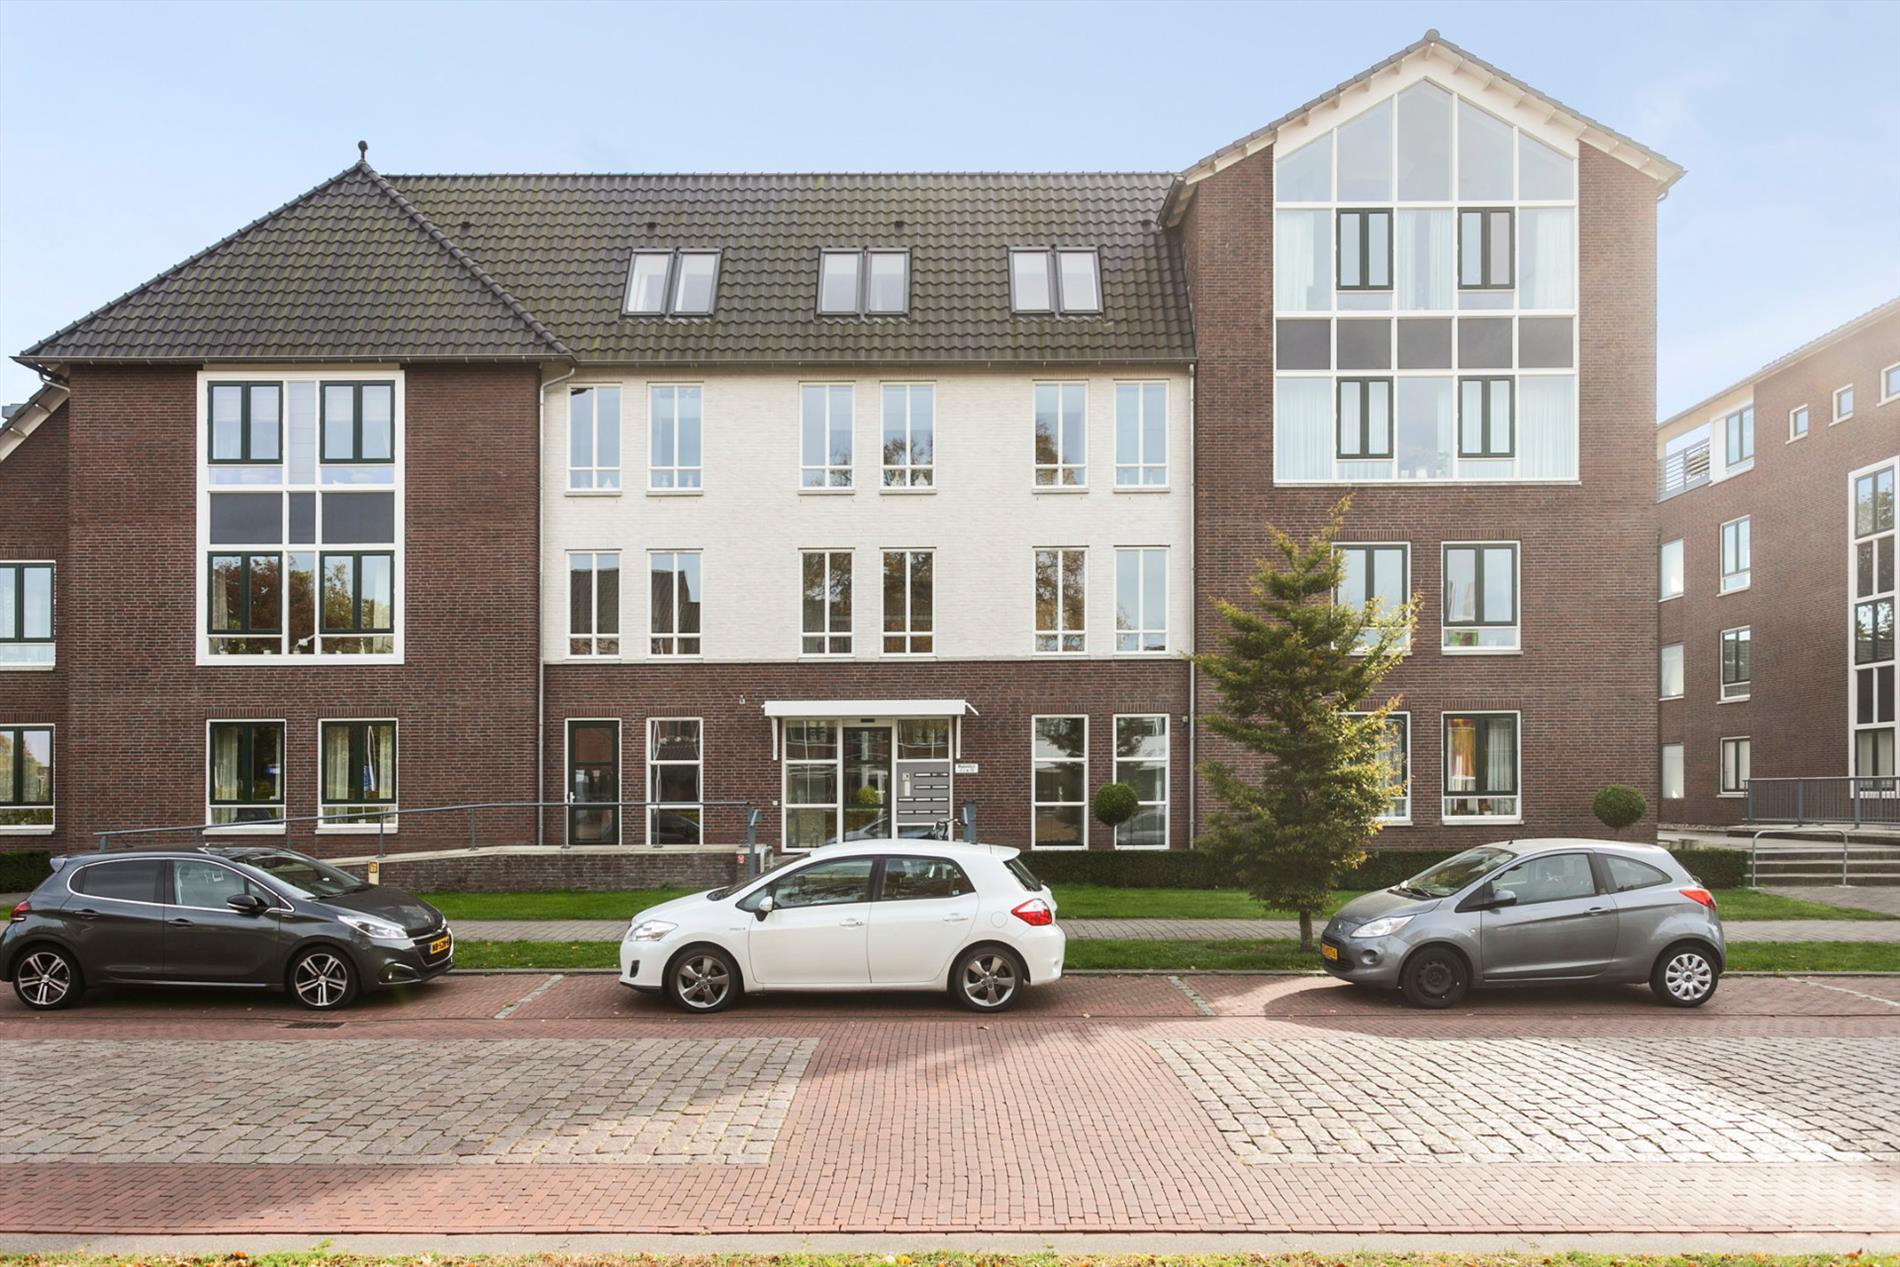 Meulenblock 20, 4631 ZZ Hoogerheide - 05862214_2.jpg